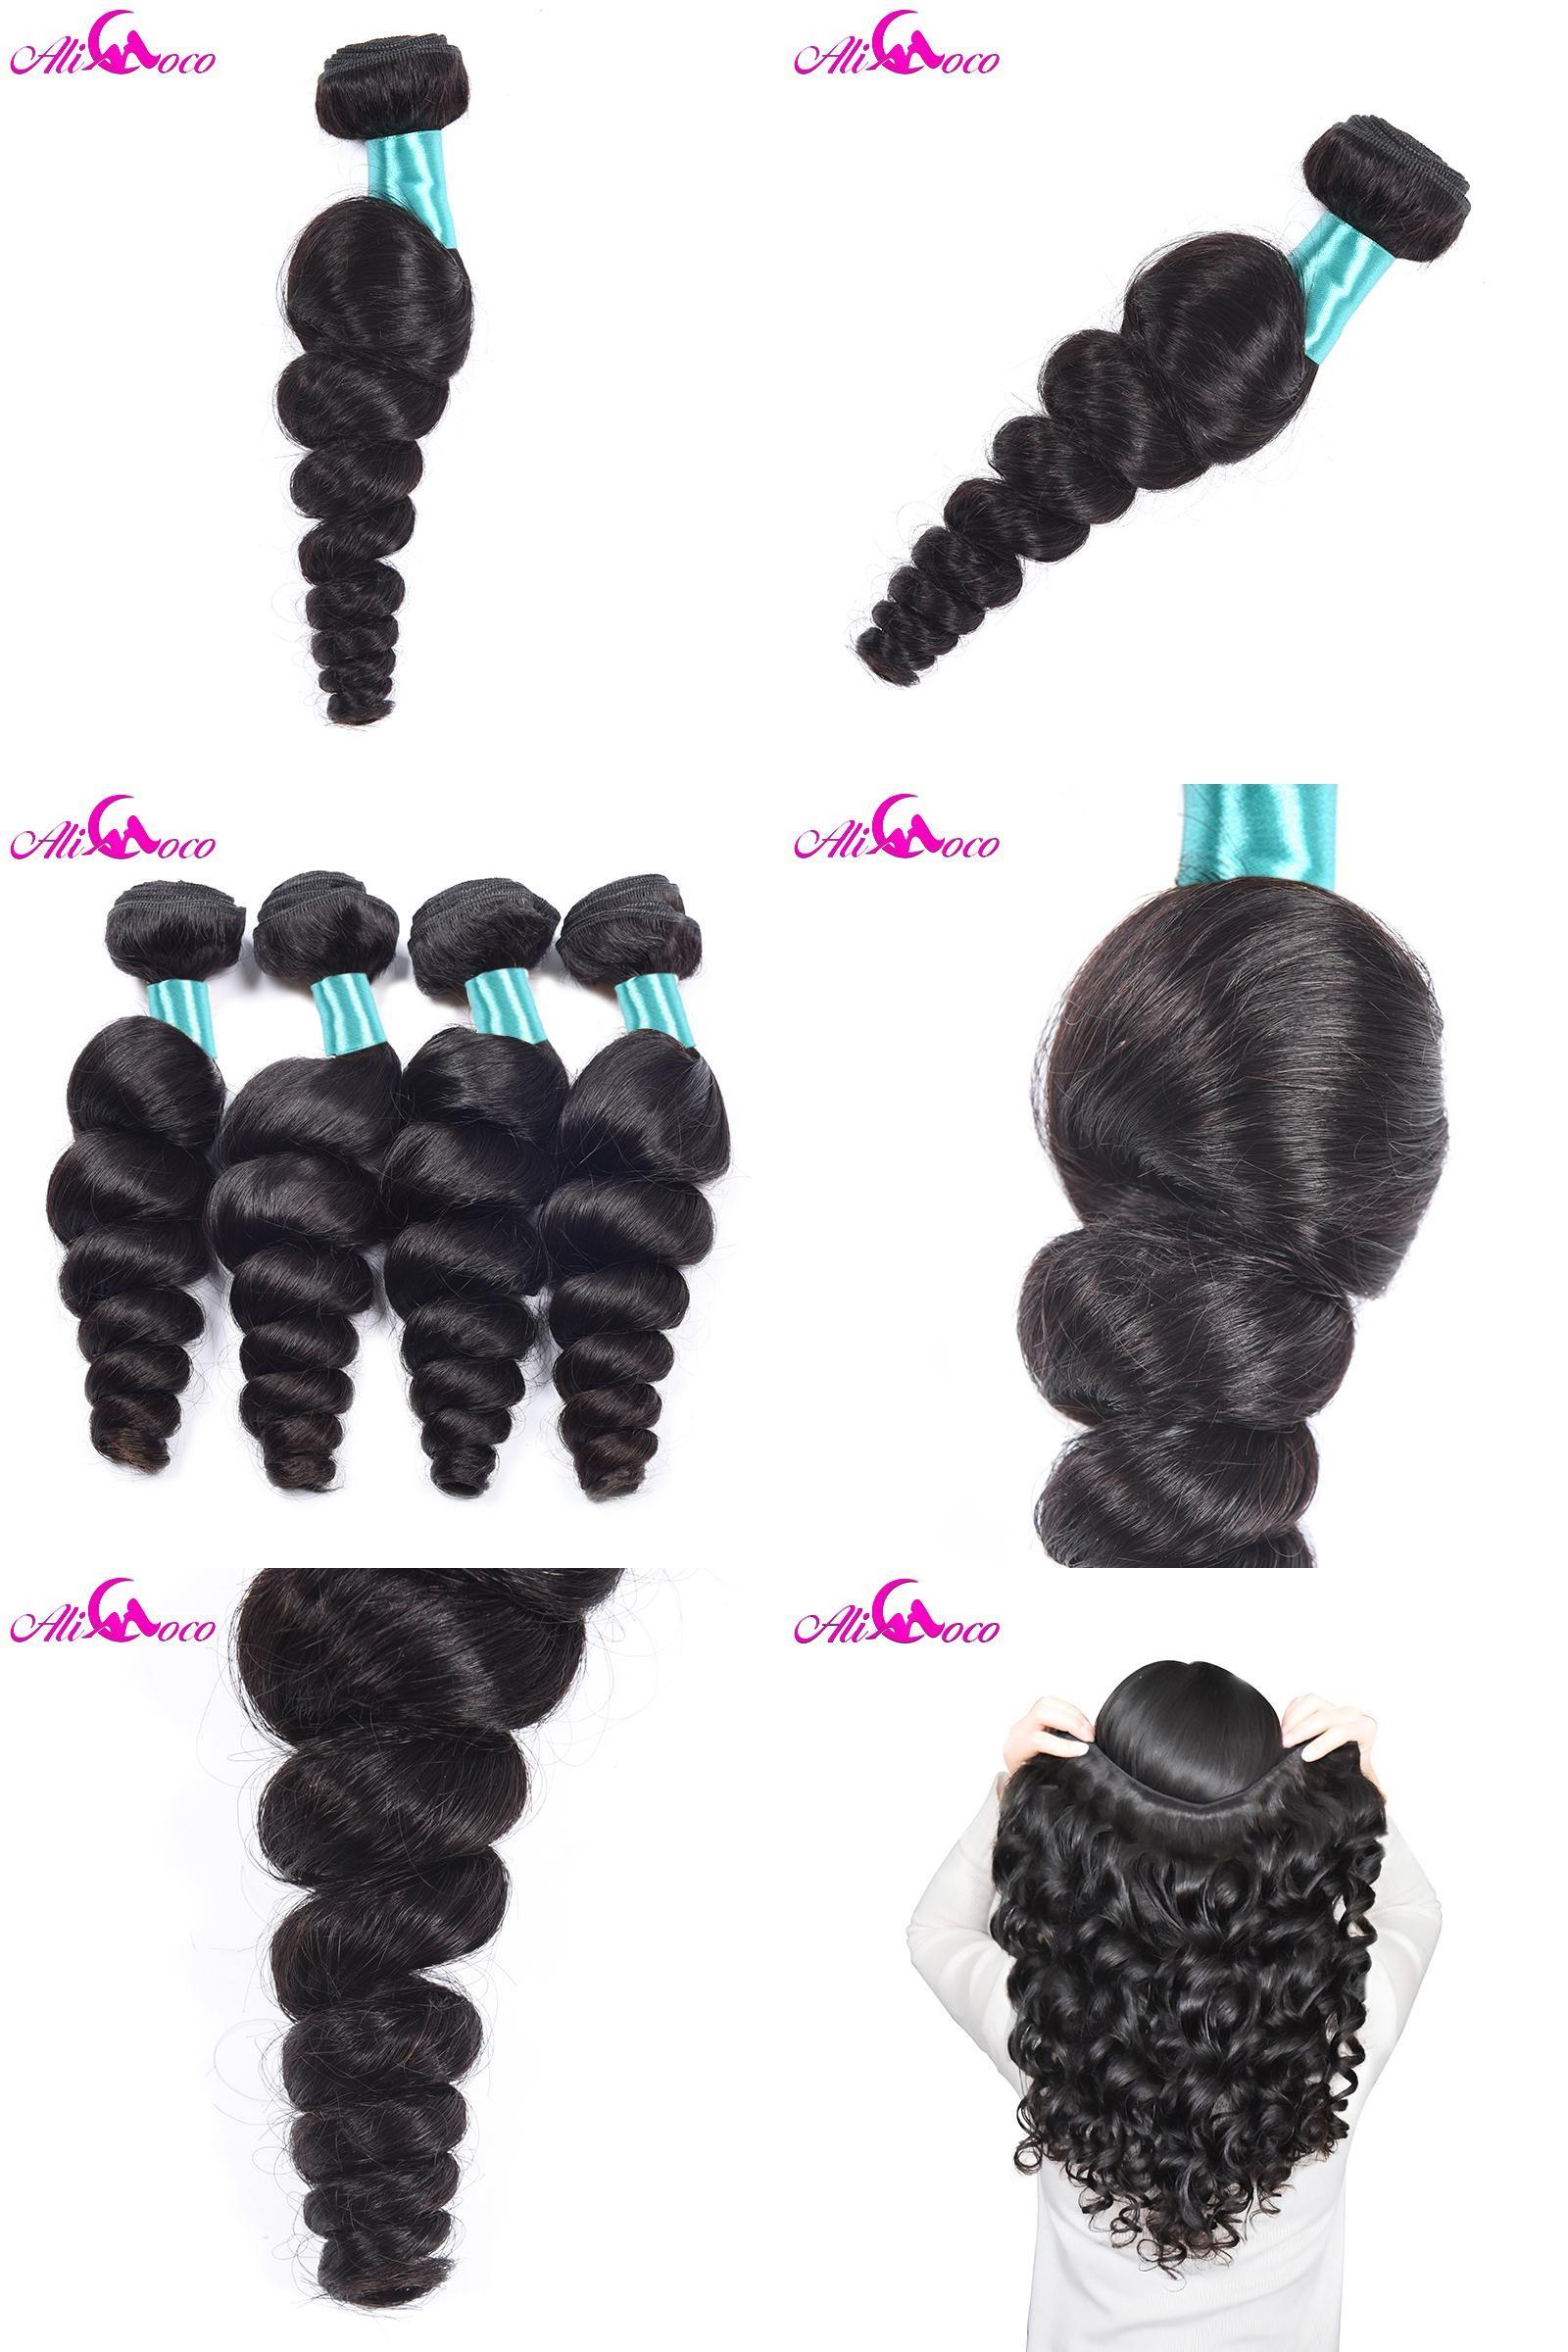 Visit To Buy Ali Coco Hair Malaysian Loose Wave Hair Bundles